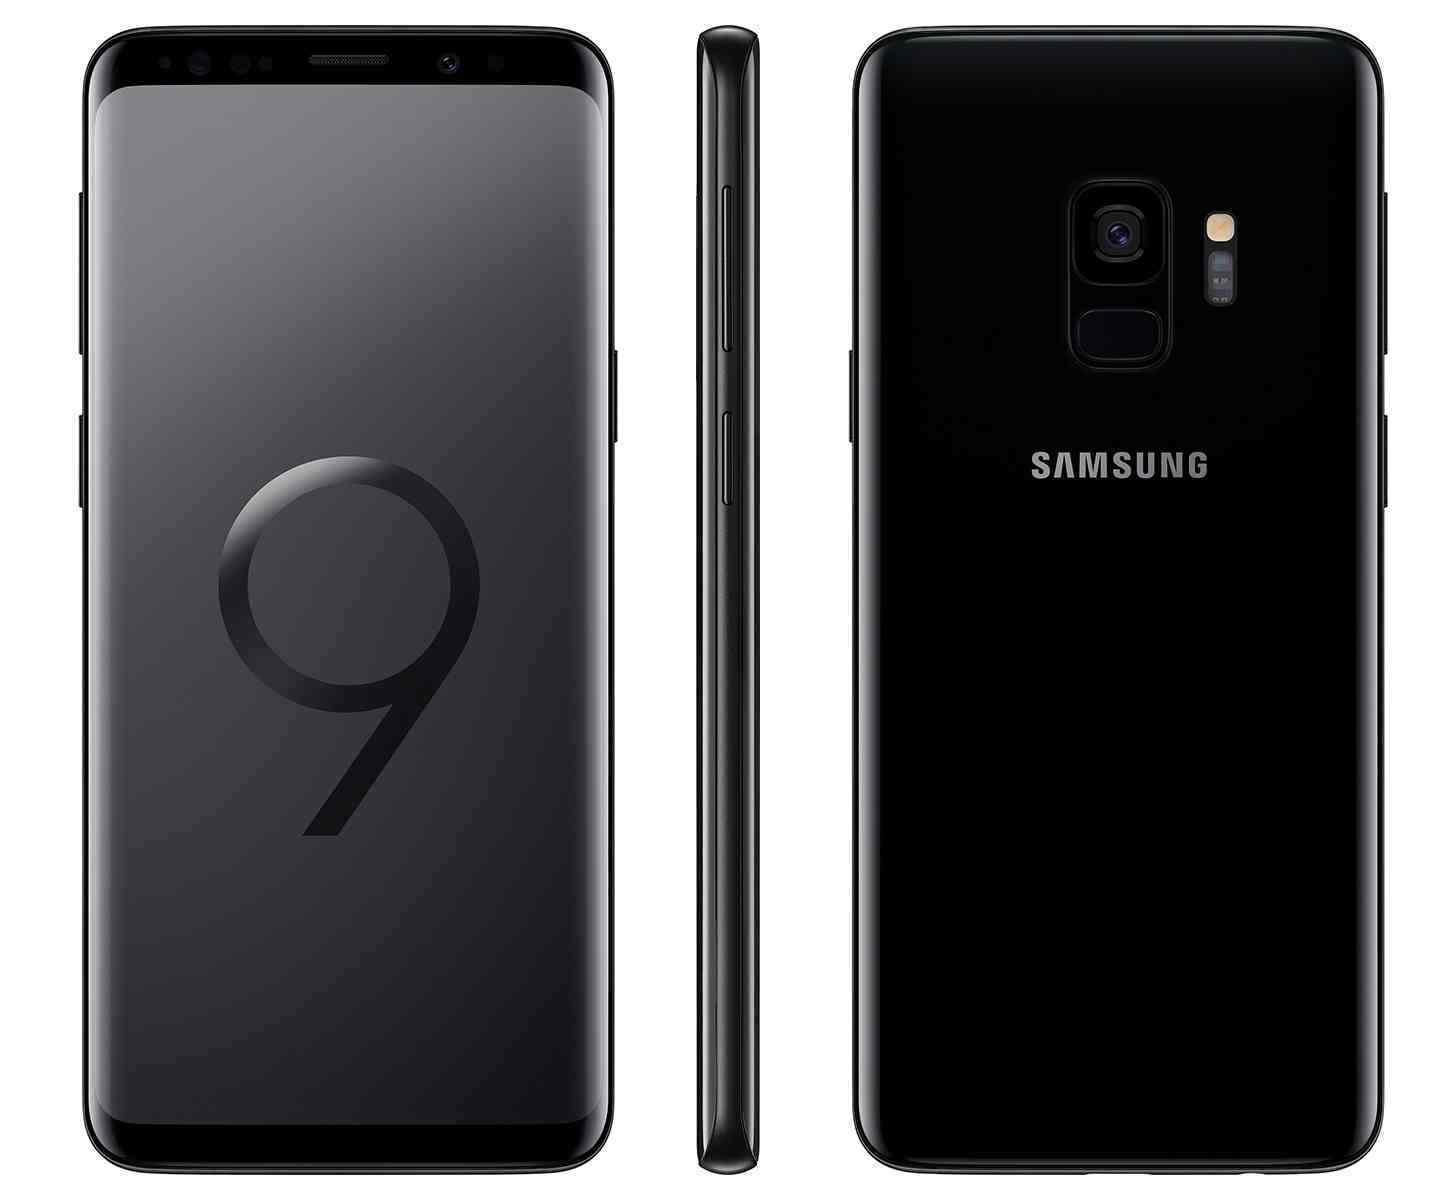 Samsung Galaxy S9  SM-G960U1 - 64GB - Midnight Black (Factory Unlocked) 9/10